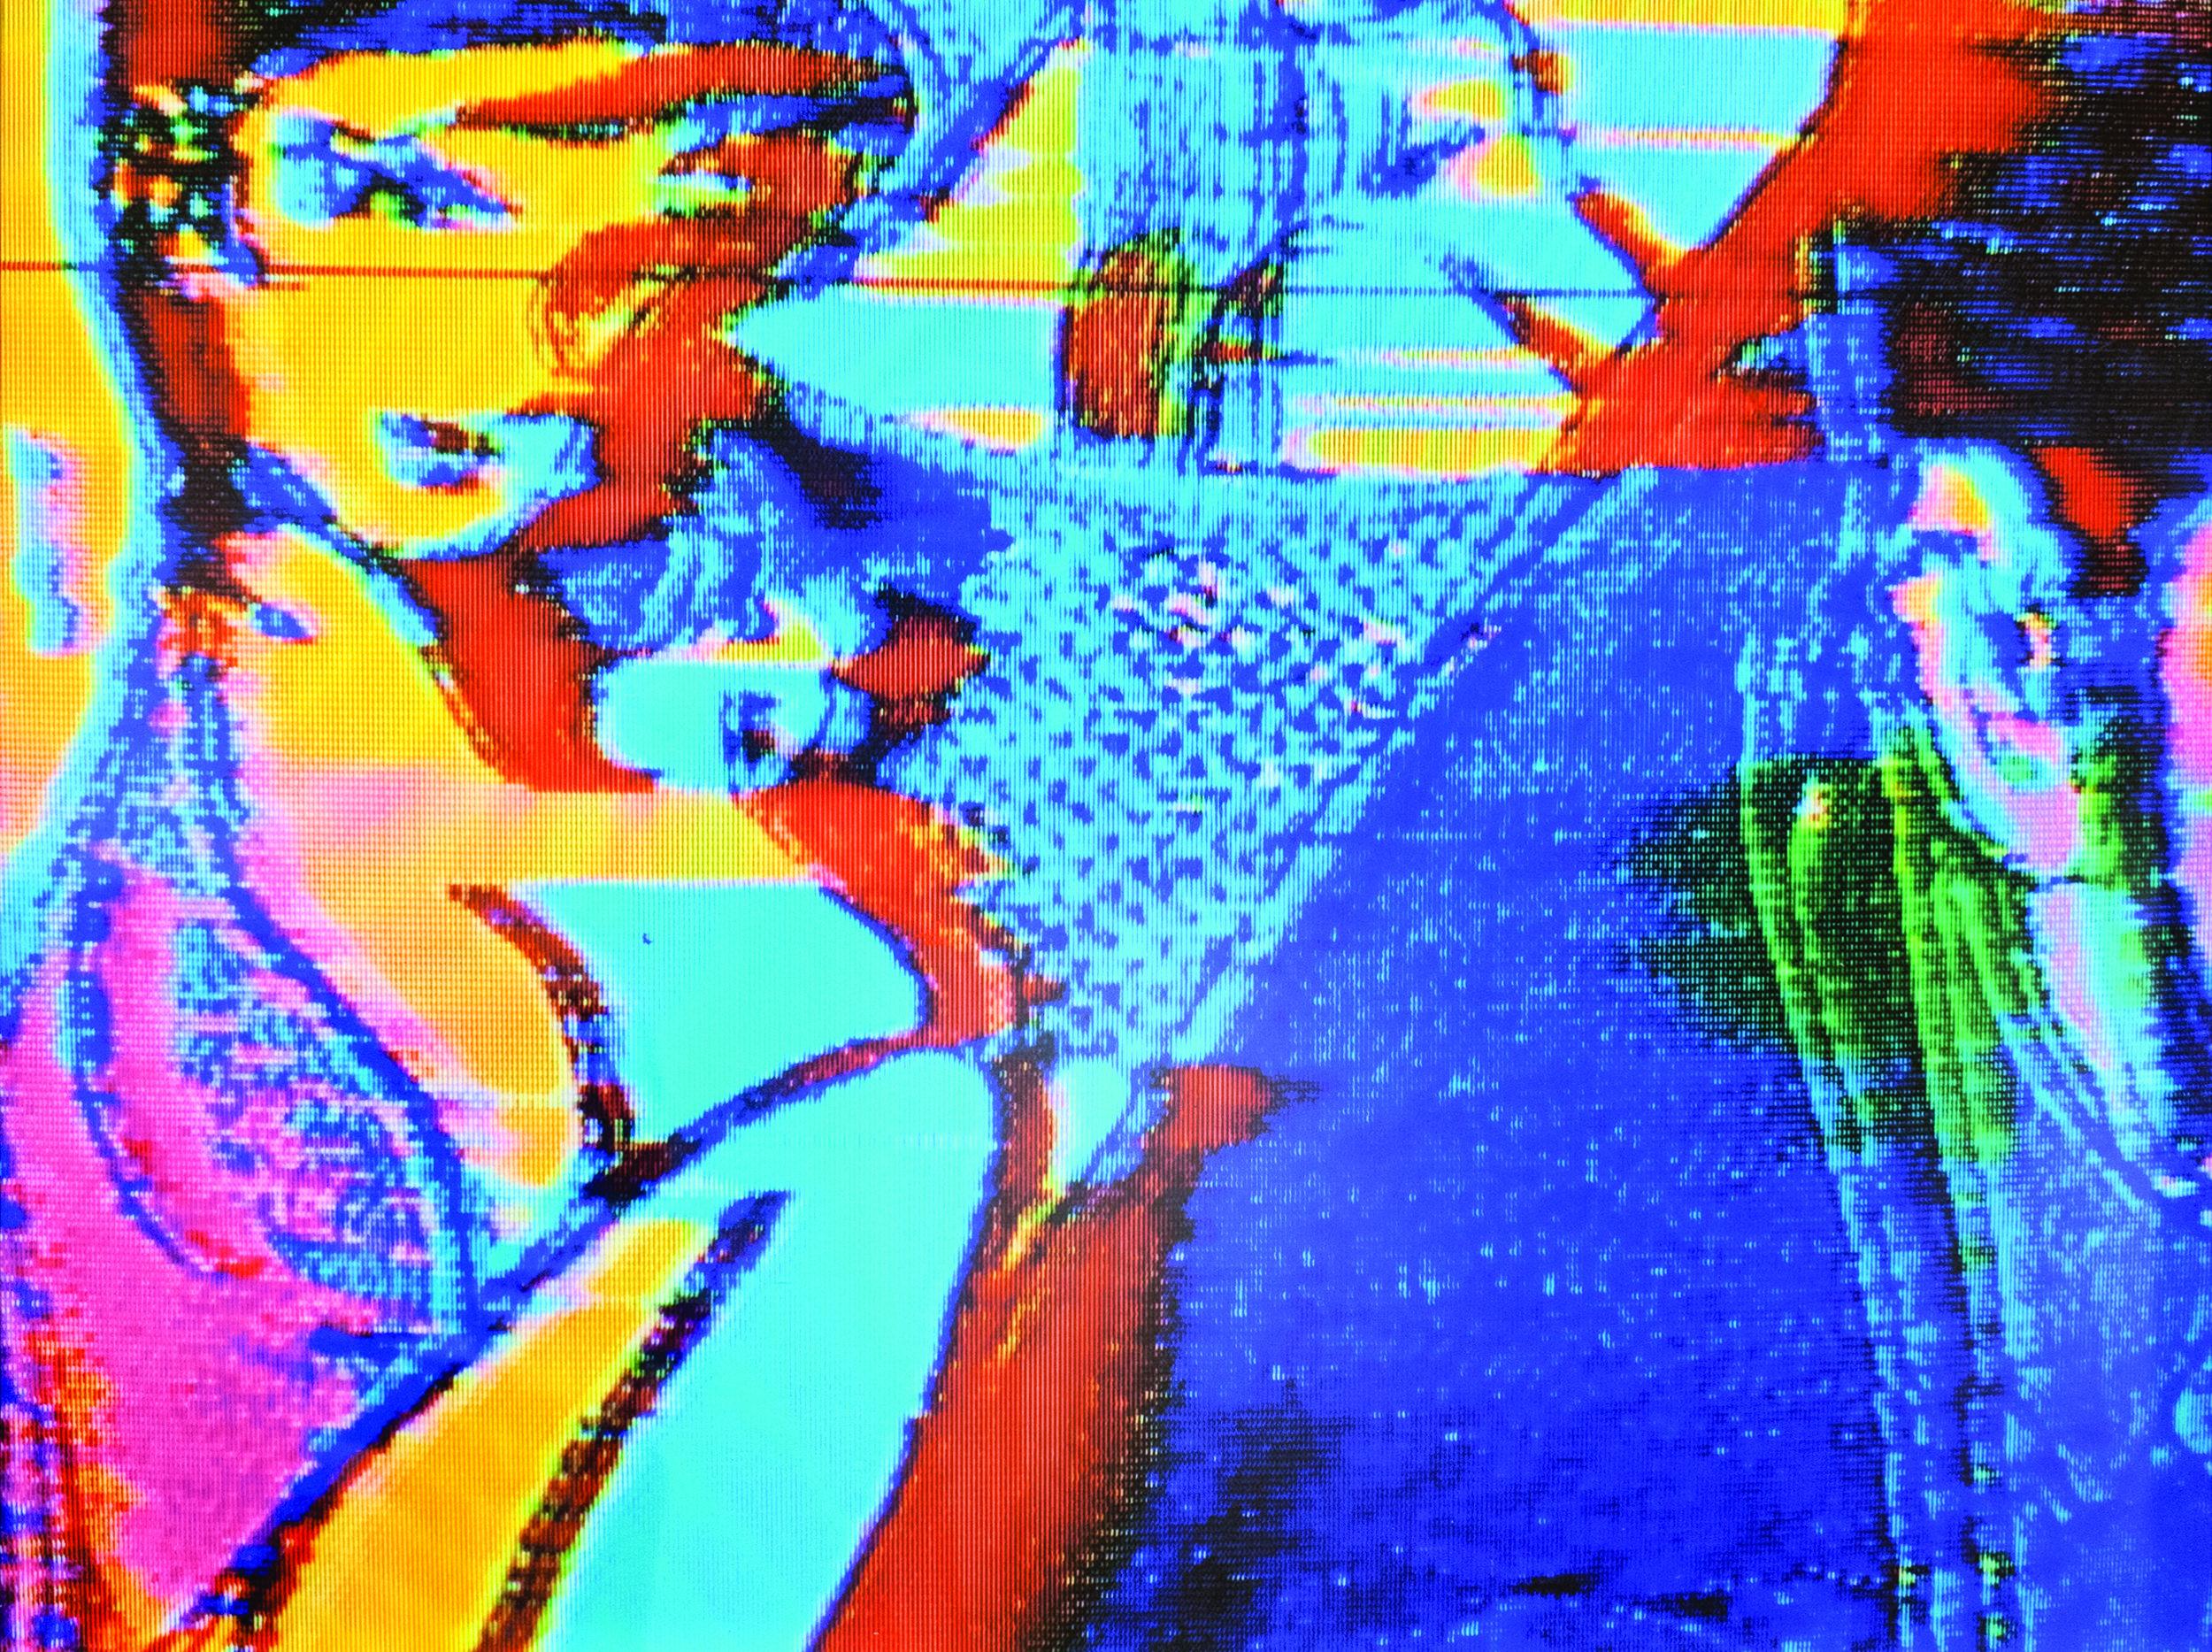 Bryan Peterson // Love Heist // 2018 // Digital Print // 9 x 12 inches